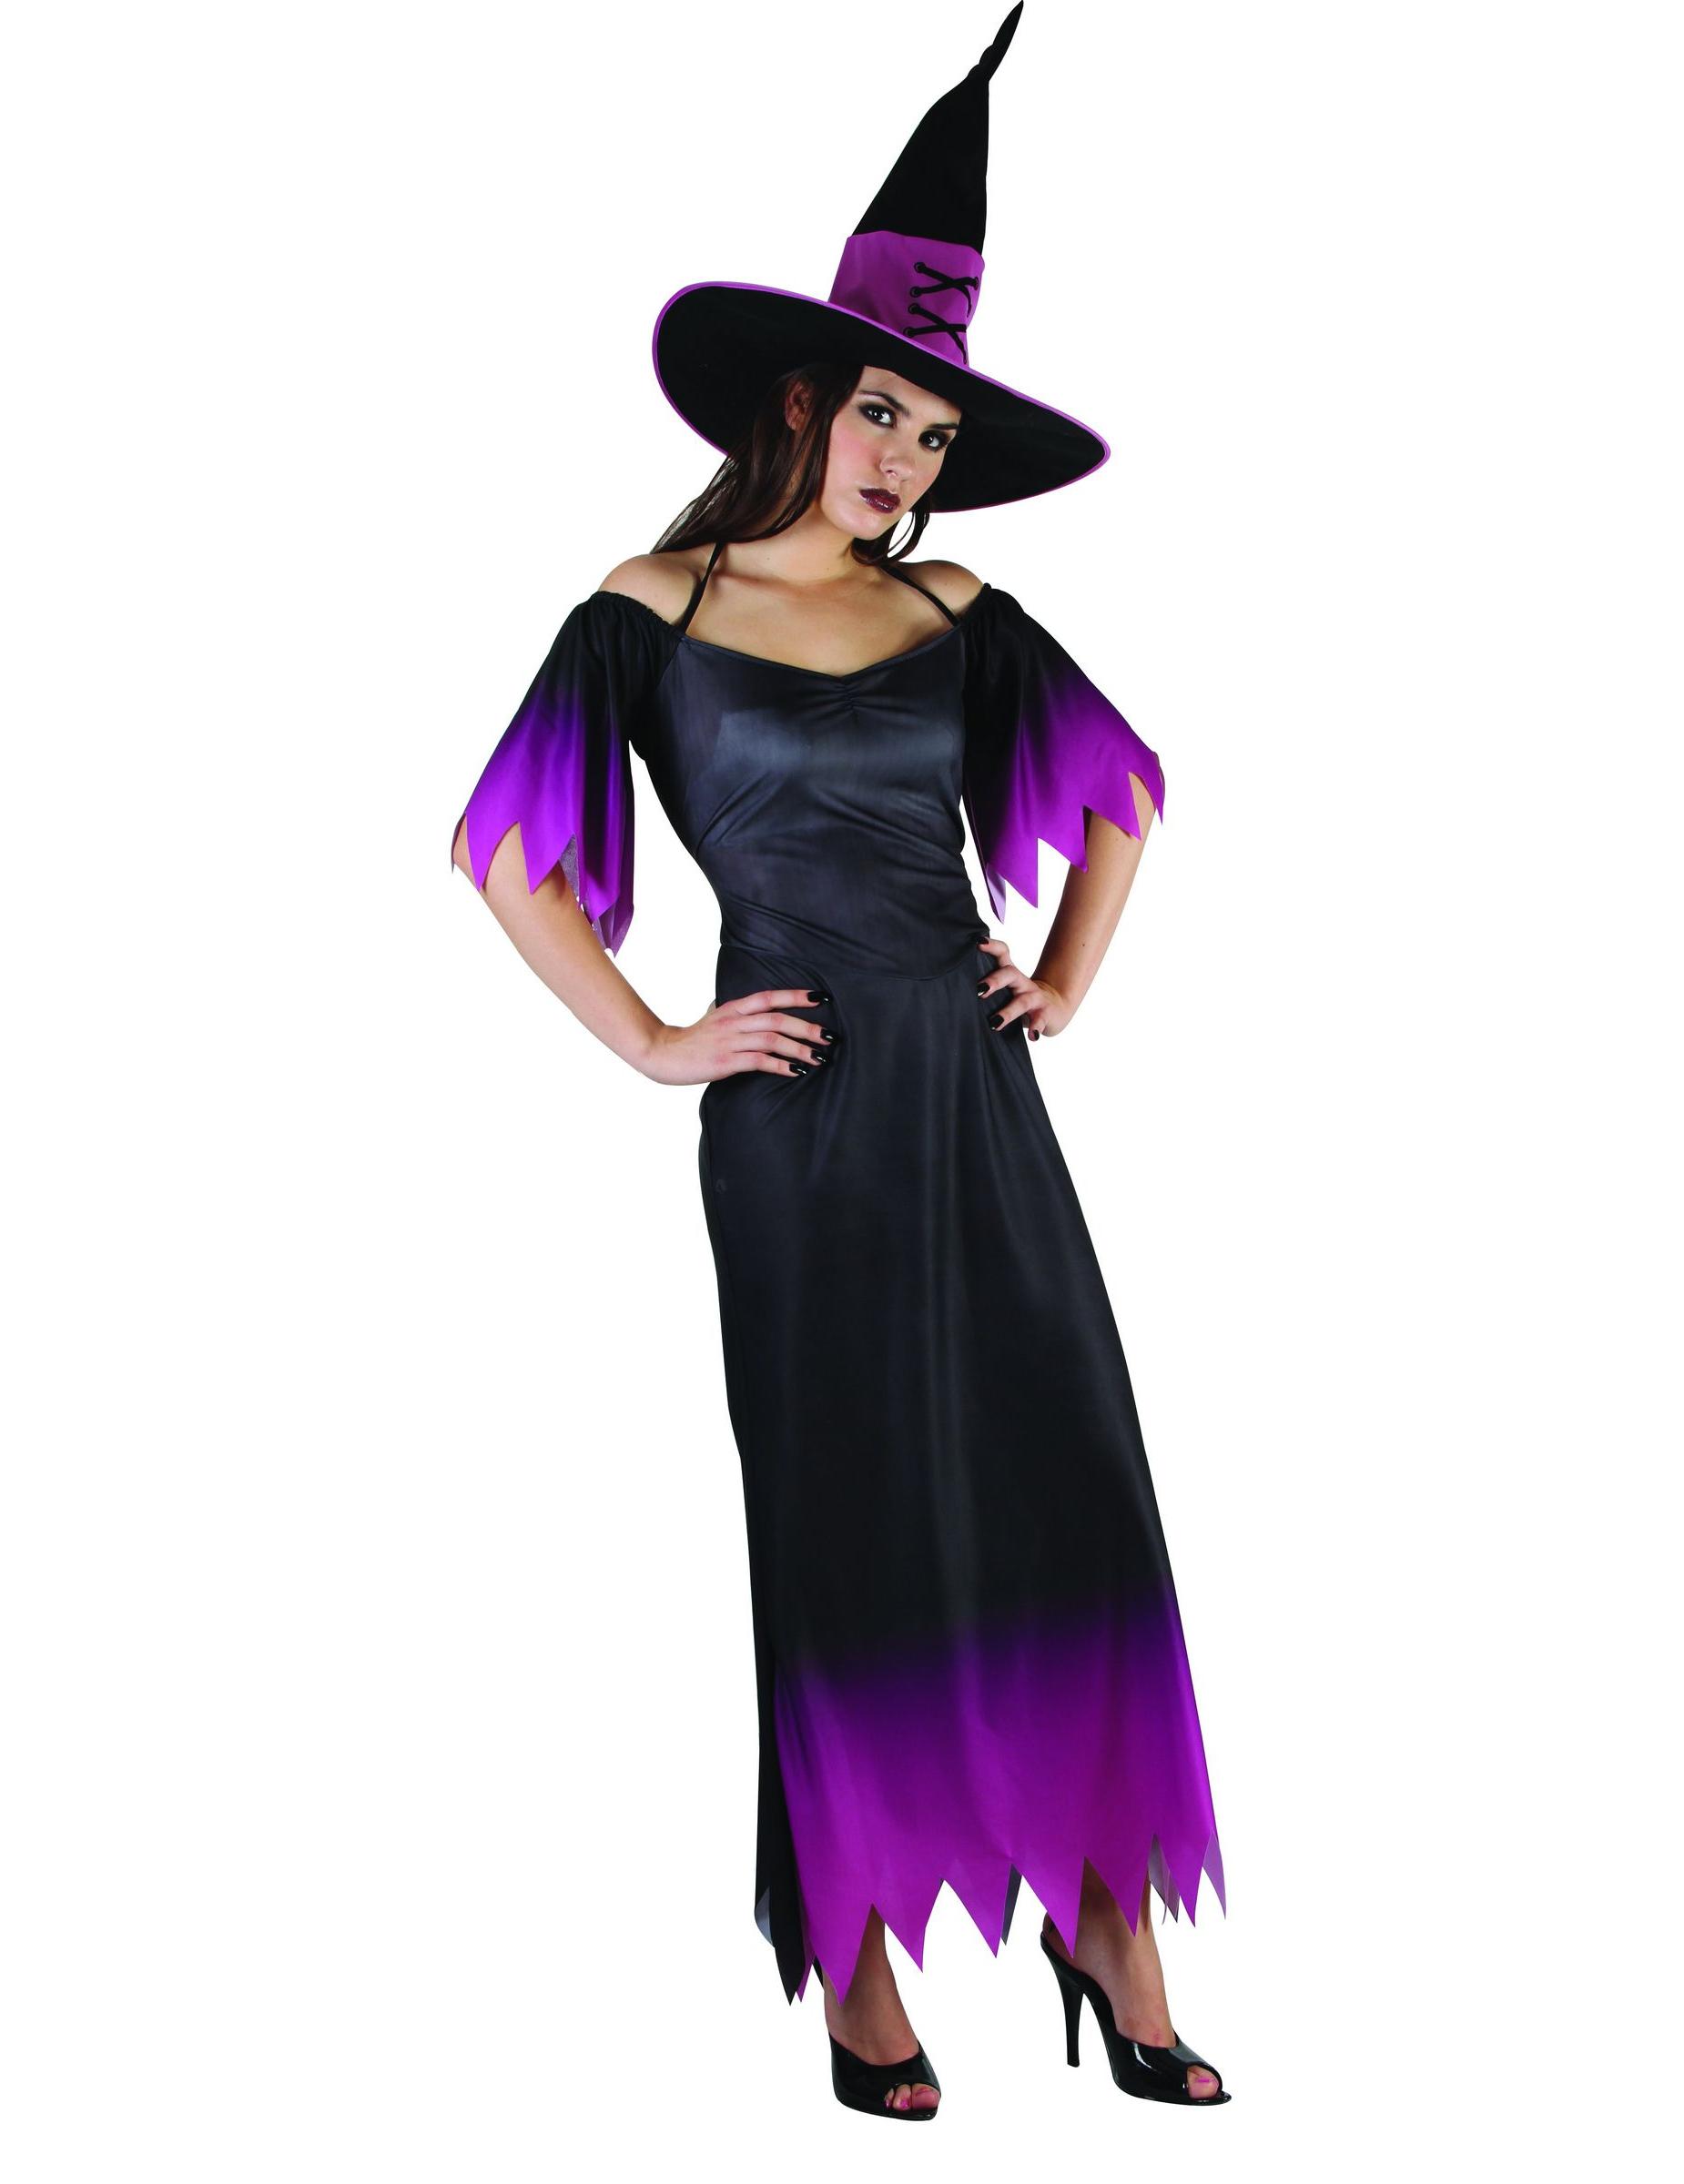 d guisement sorci re femme halloween vegaoo party achat. Black Bedroom Furniture Sets. Home Design Ideas